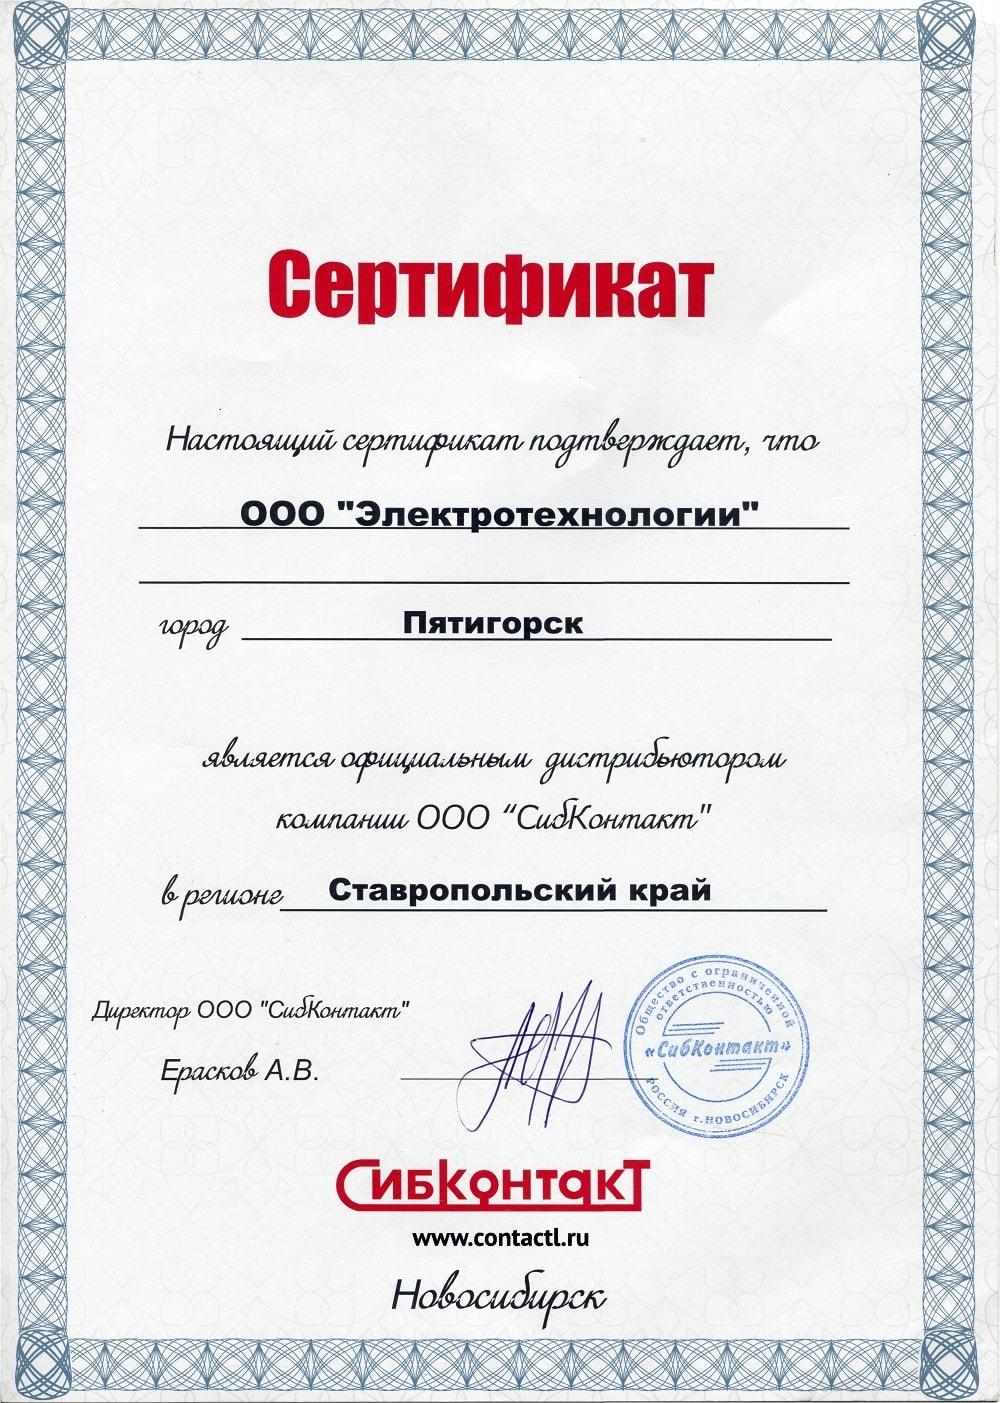 Сертификат дистрибьютора Сибконтакт ООО Электротехнологии